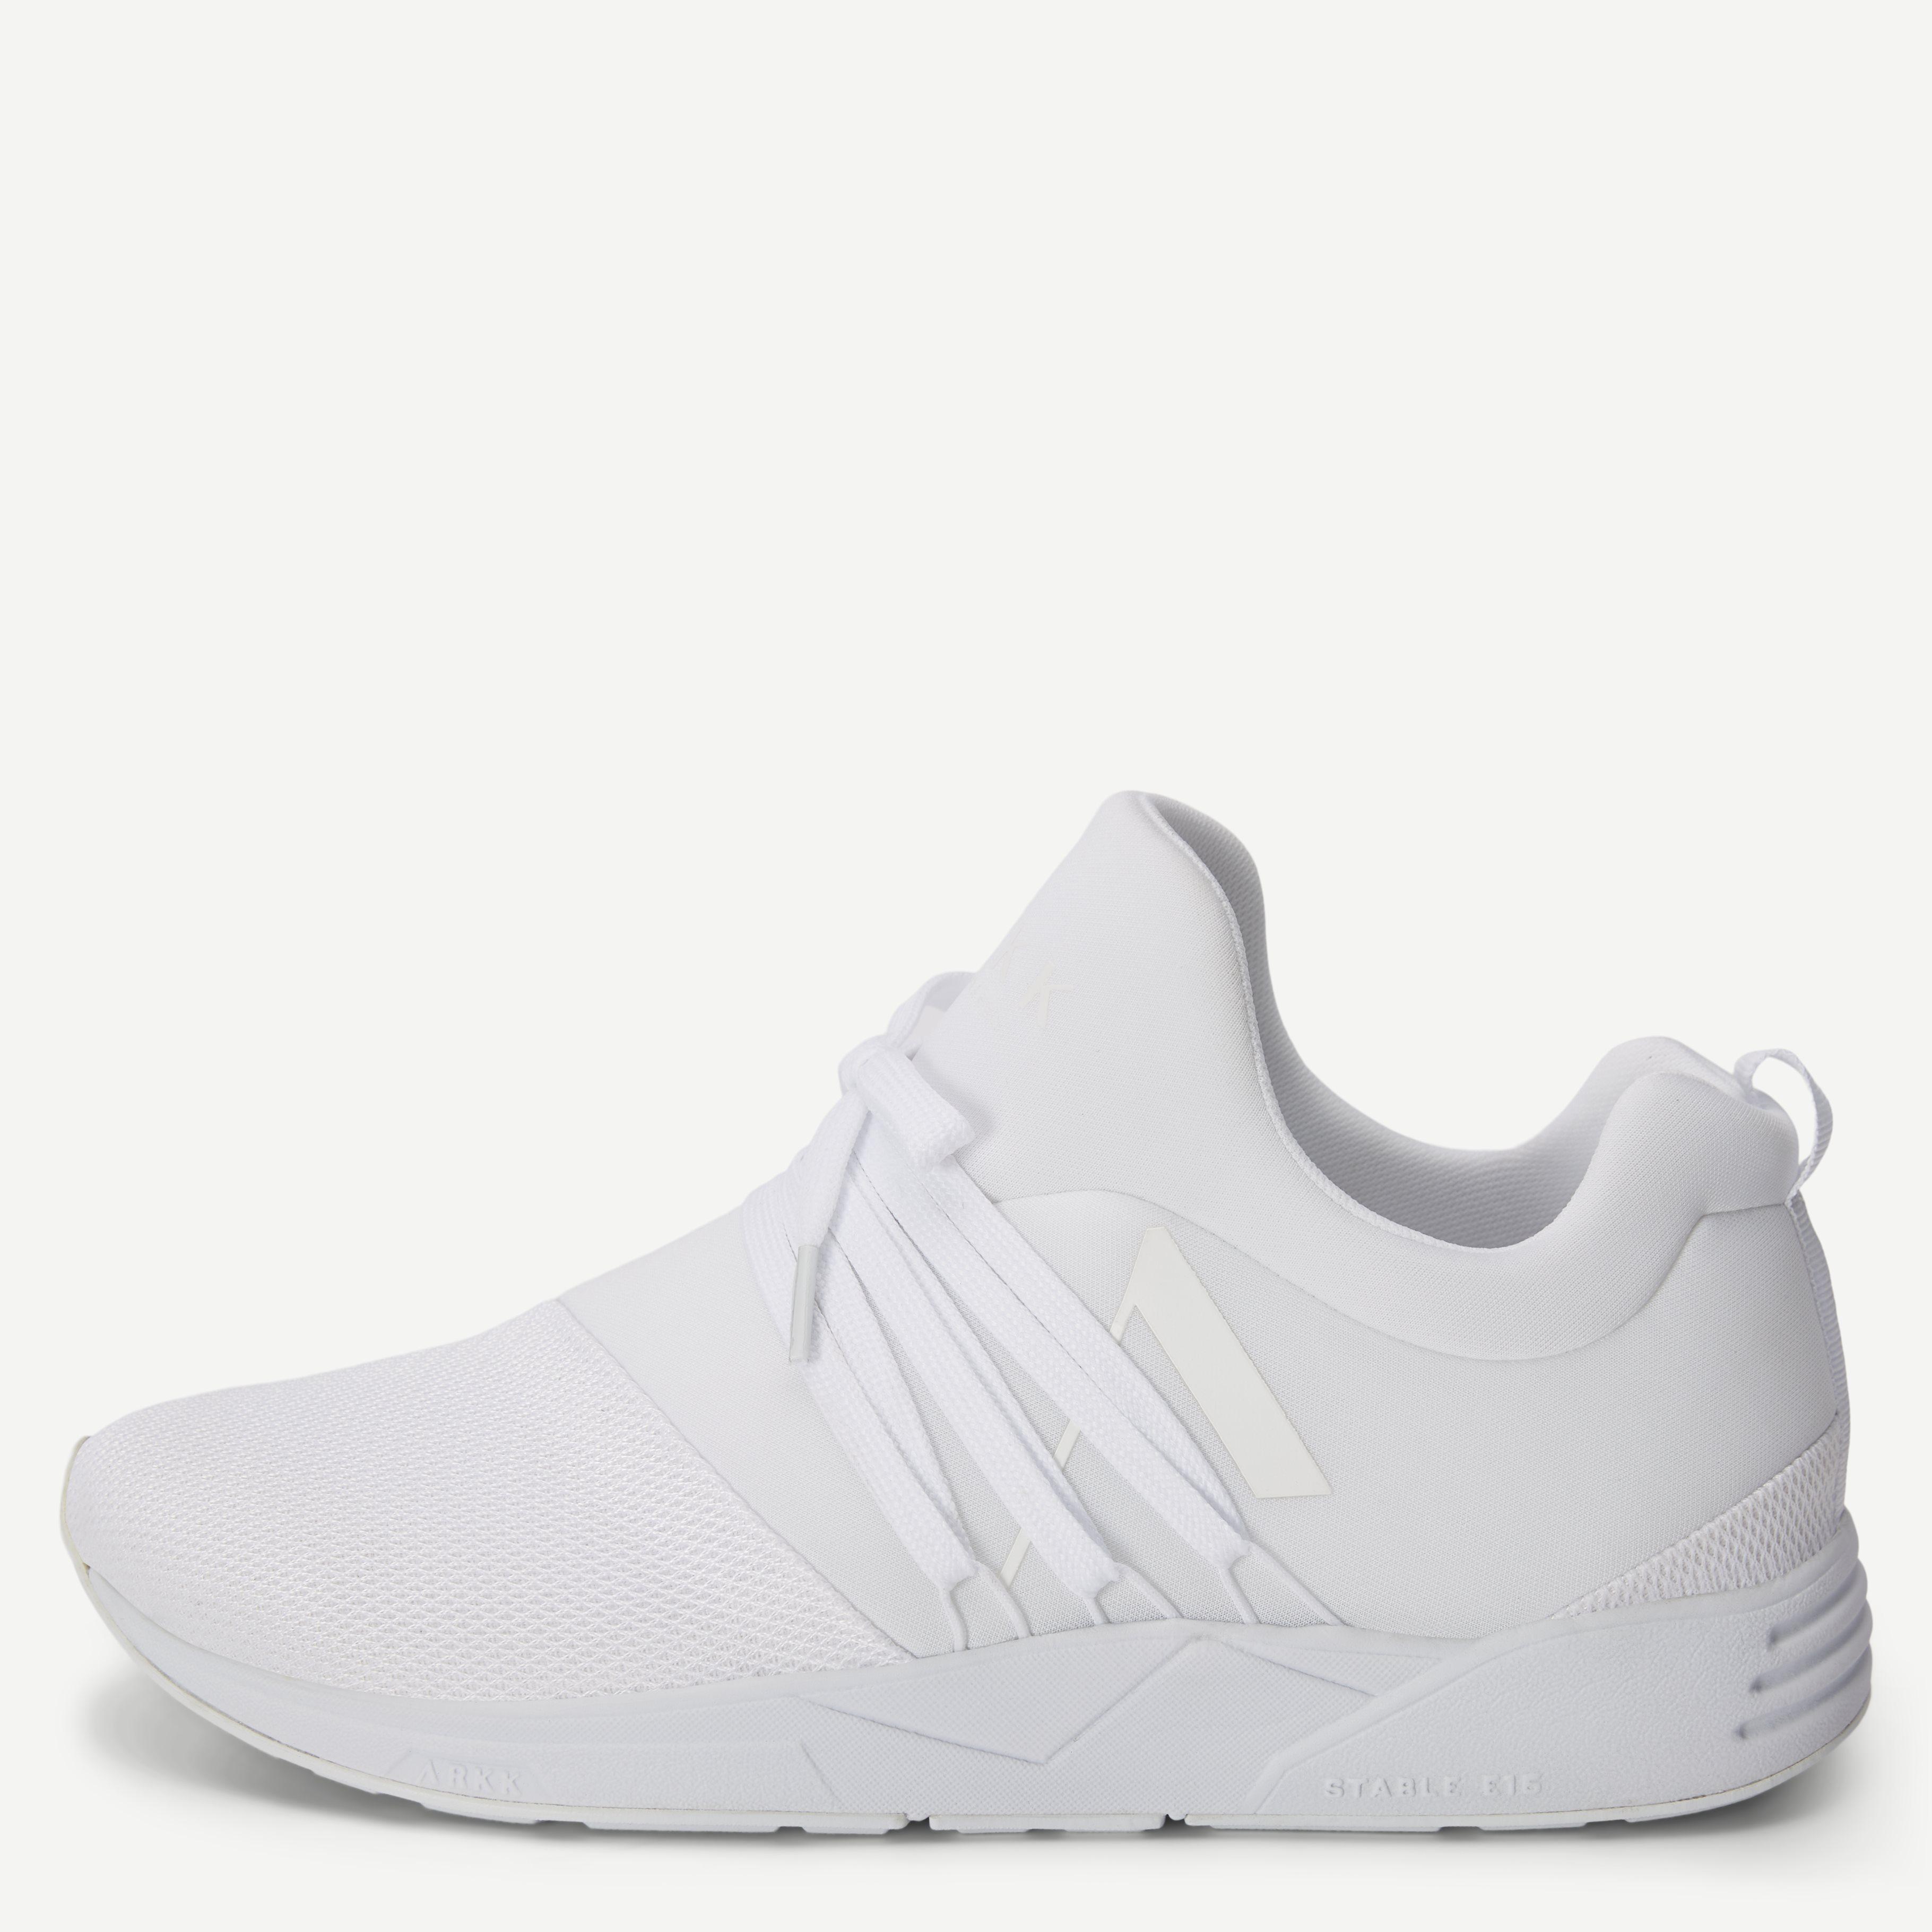 Raven Mesh Sneakers - Sko - Hvid